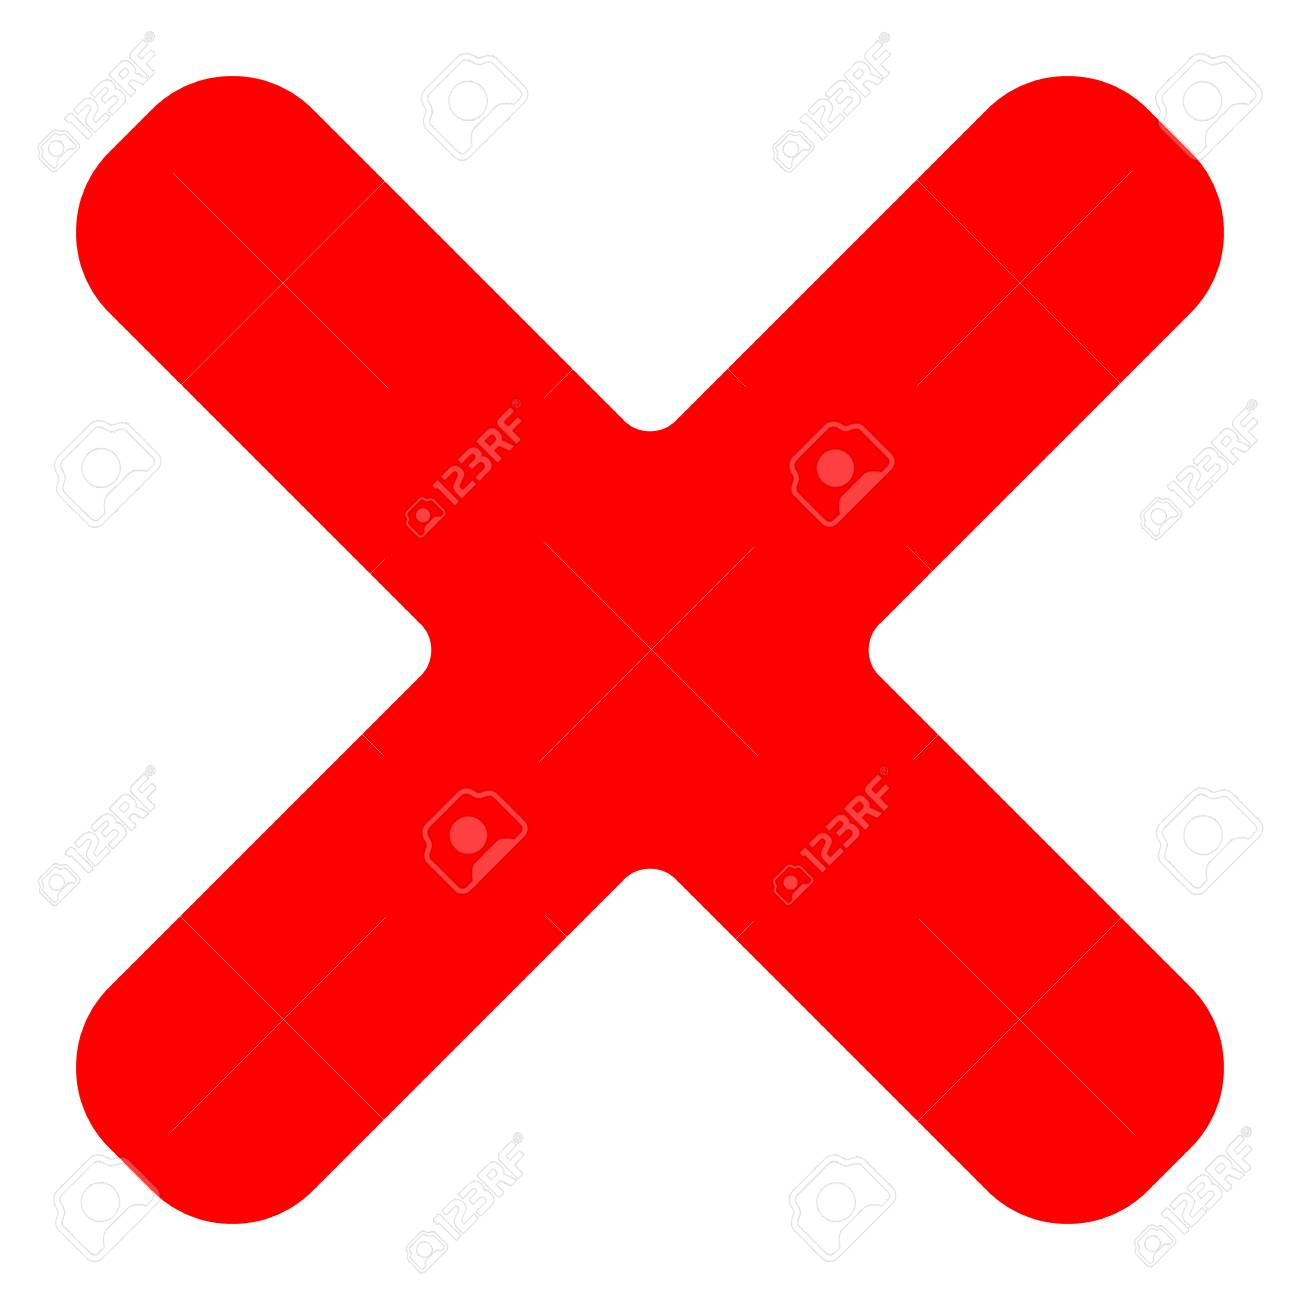 Red cross symbol icon as delete remove fail failure or red cross symbol icon as delete remove fail failure or incorrect answer biocorpaavc Images